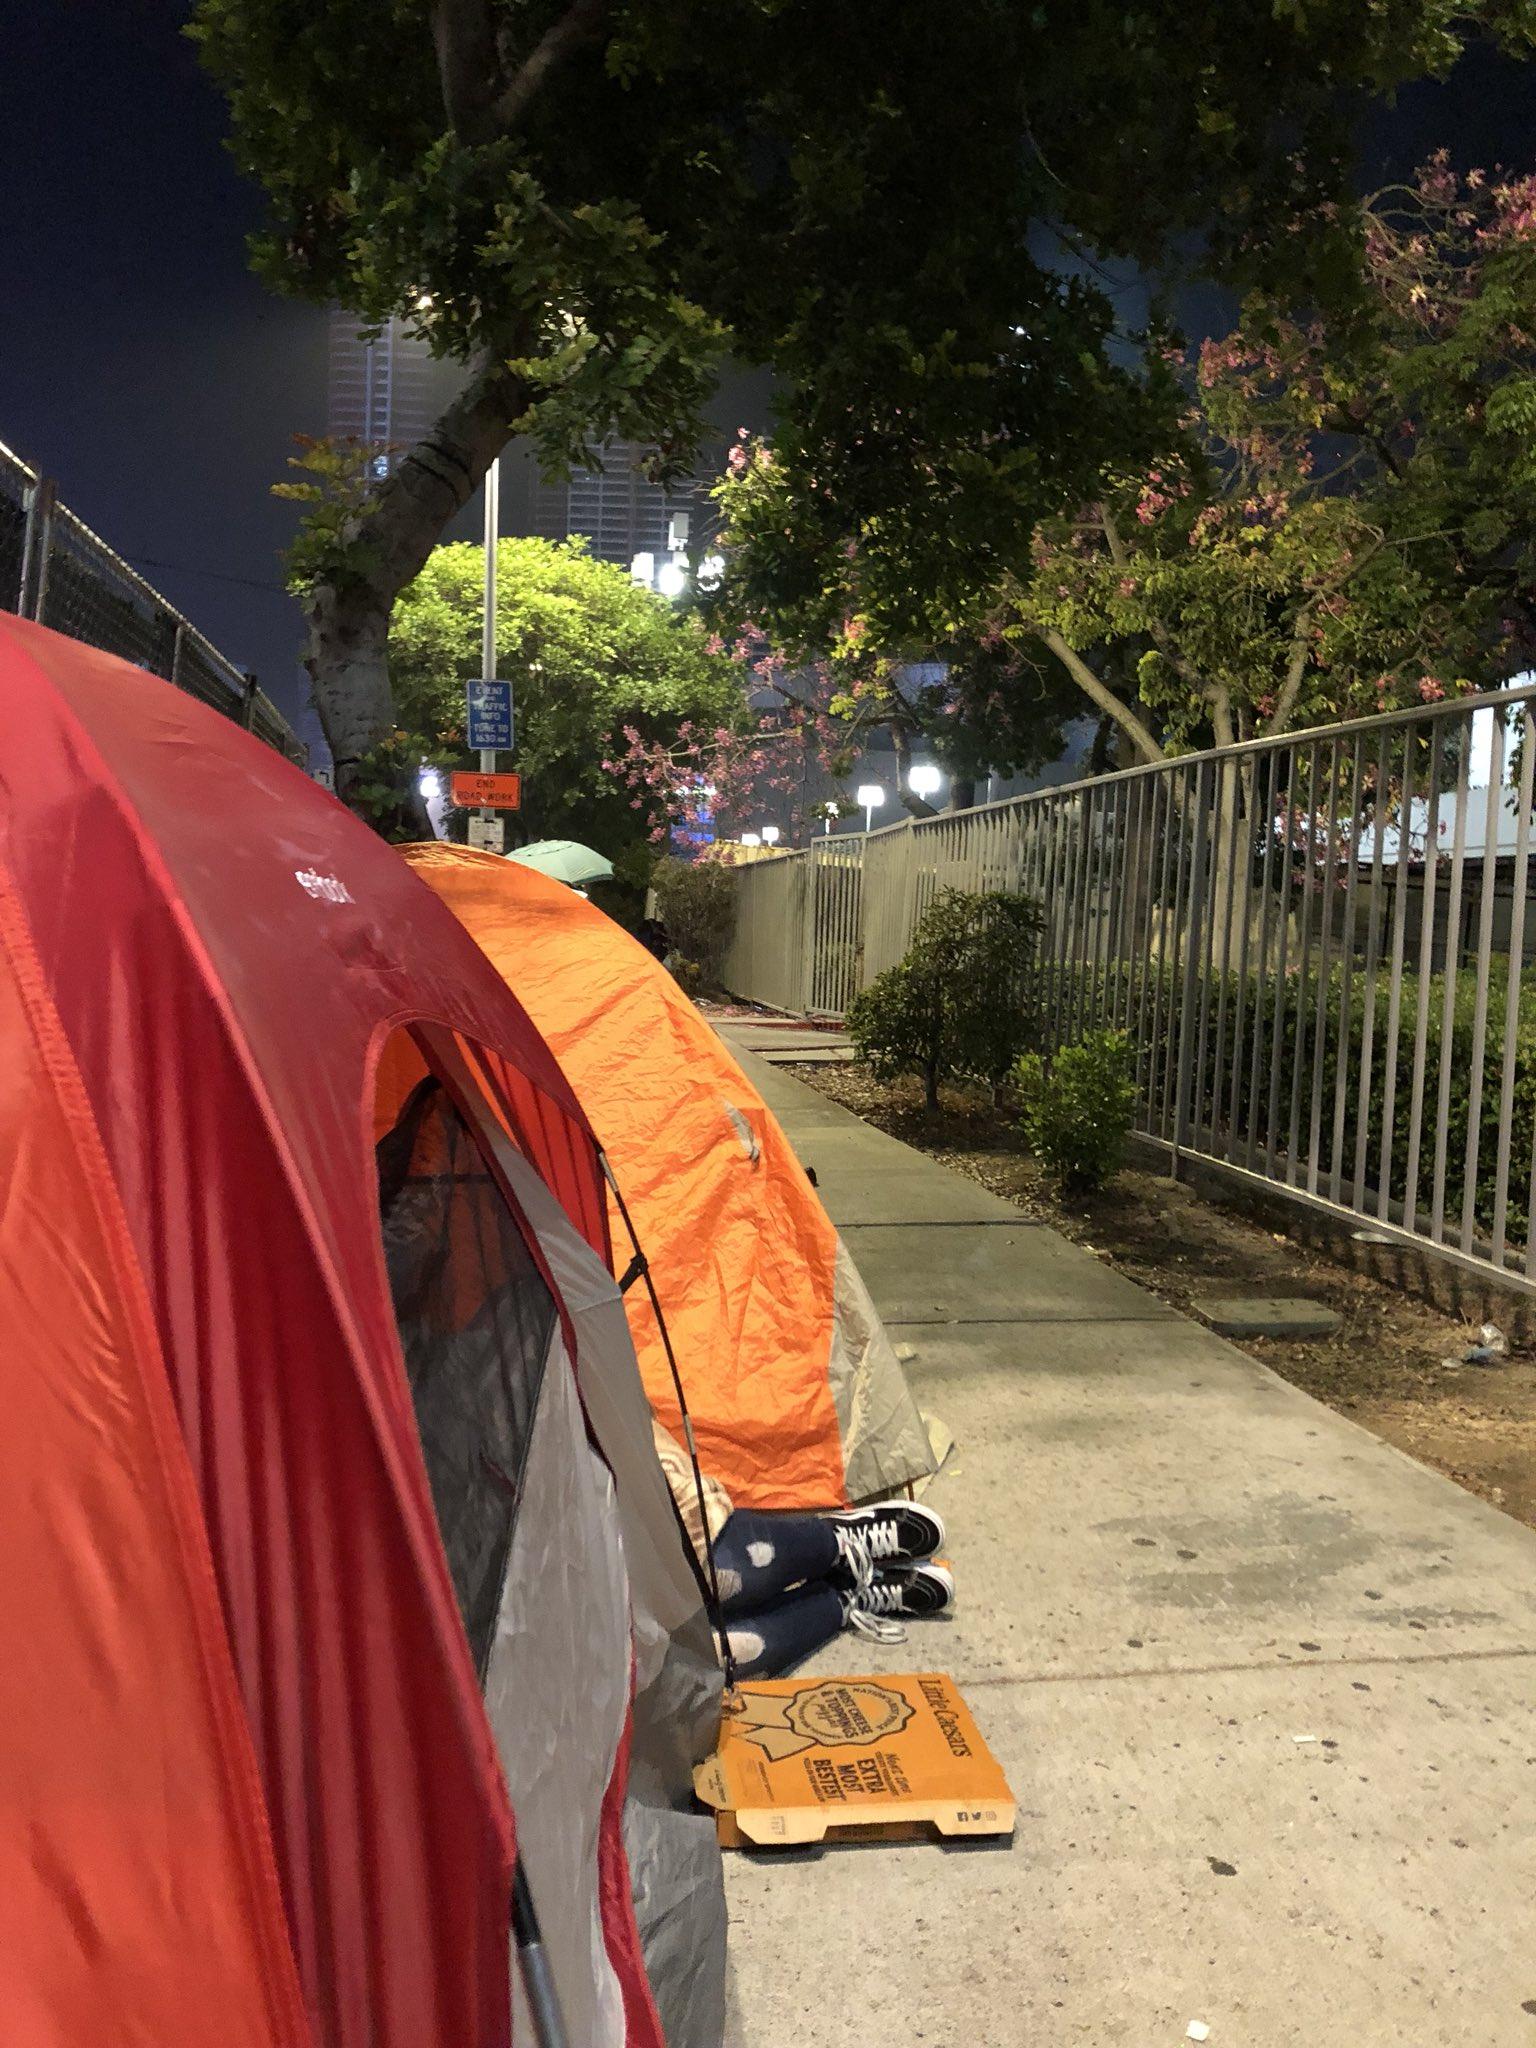 Camping out again https://t.co/AuWWJUop13 https://t.co/WaJZgkWunU